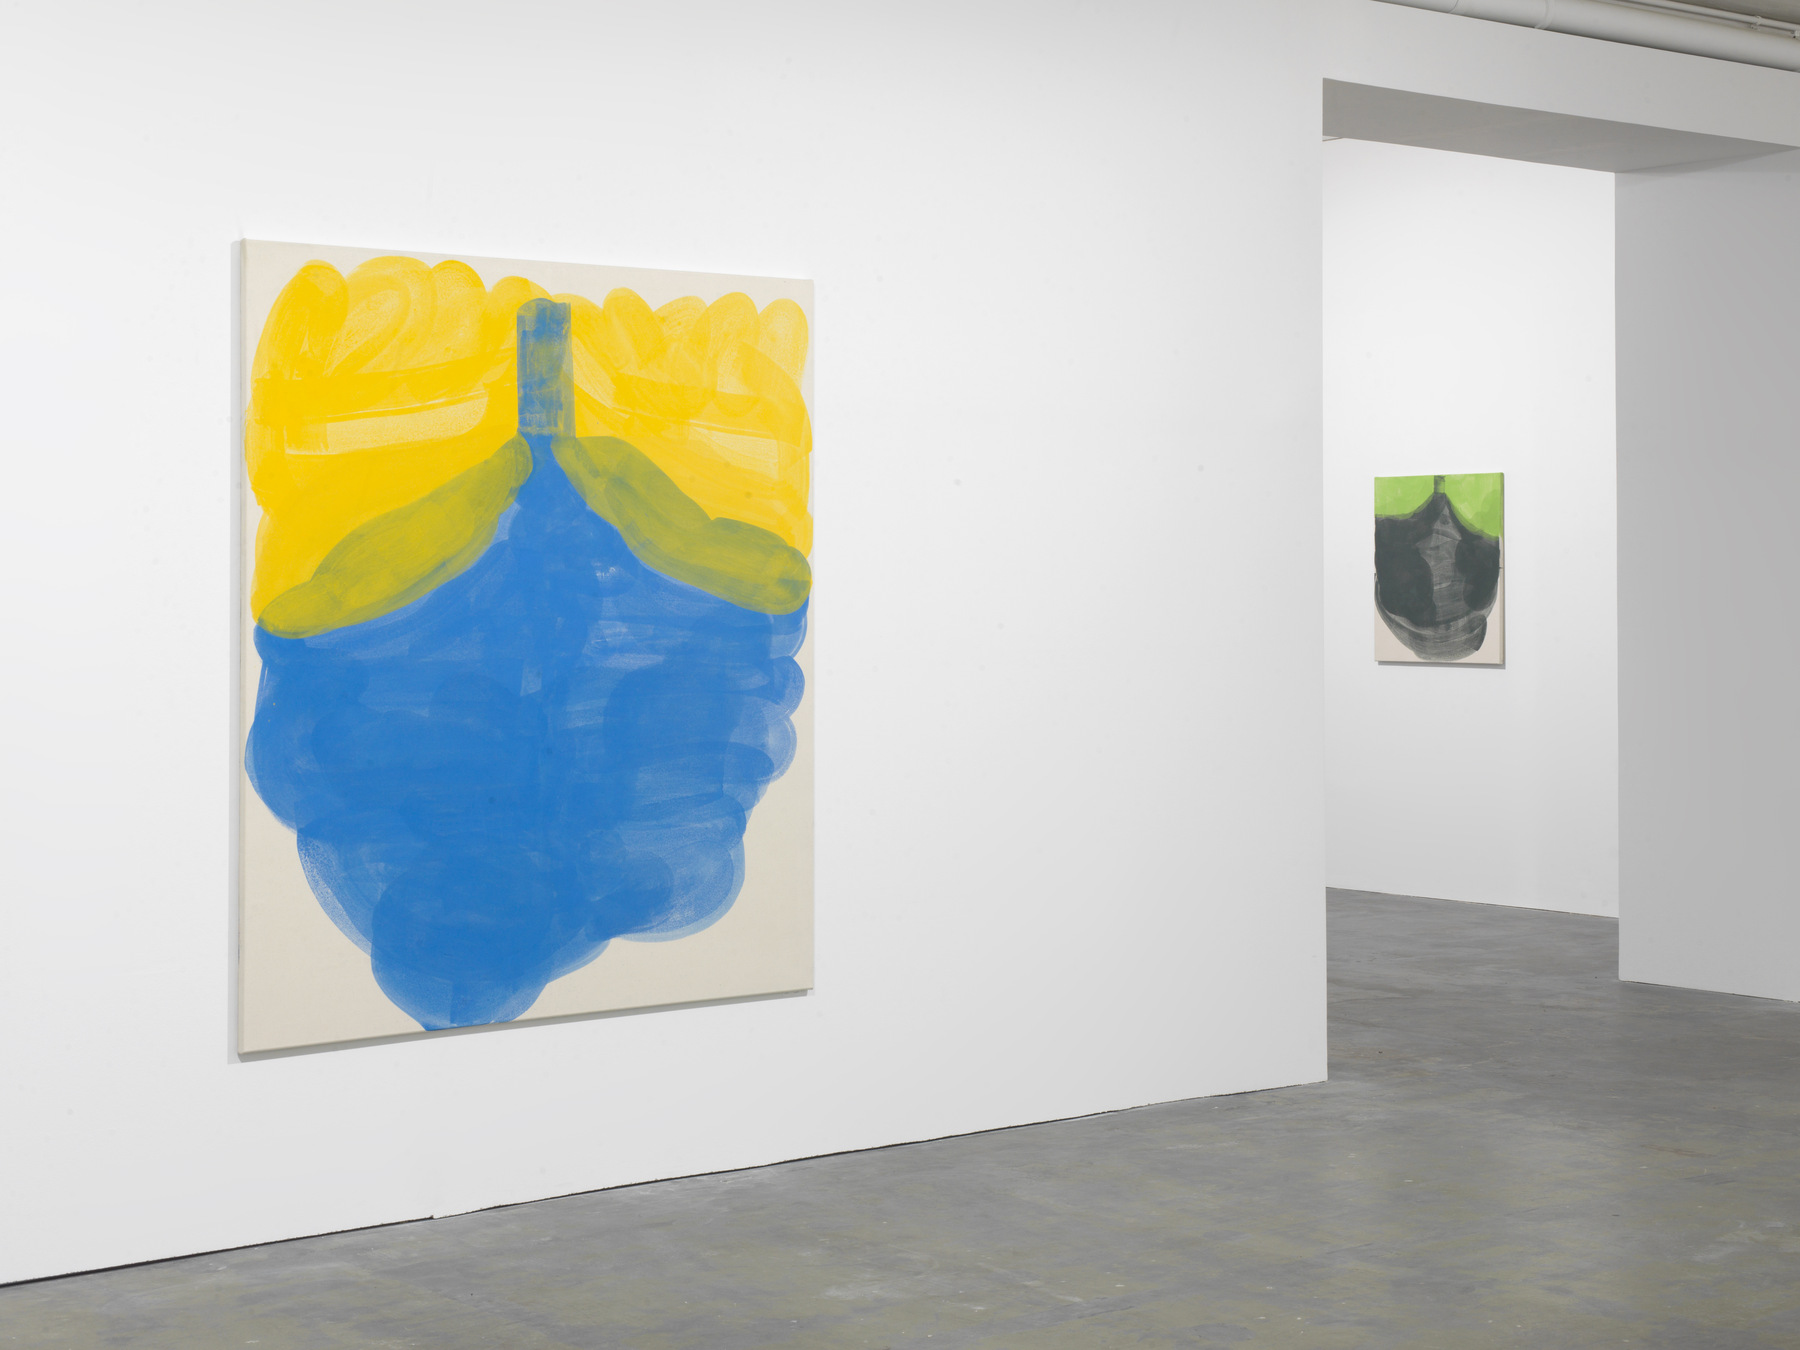 Tamina Amadyar_10,000 hours_Galerie Guido W. Baudach, Berlin_05